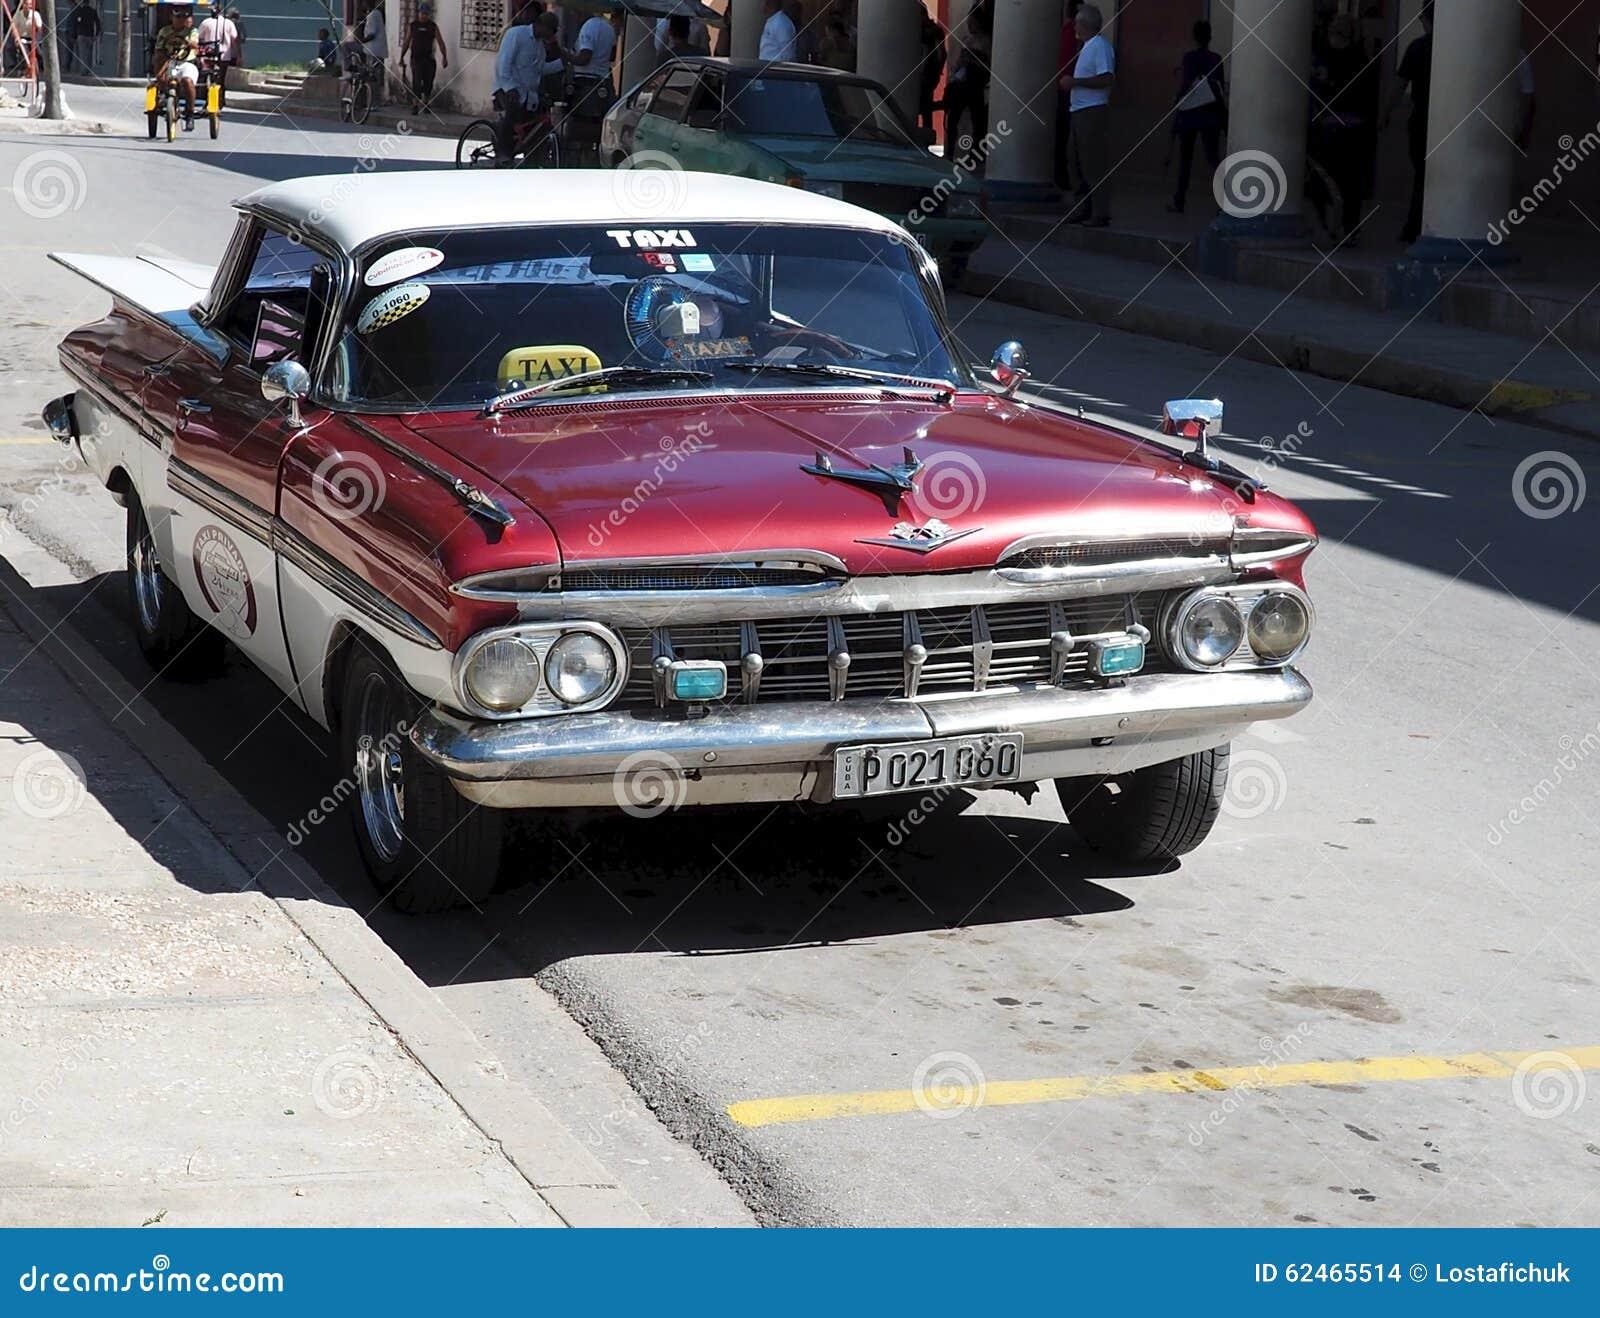 vieilles voitures am ricaines au cuba image stock ditorial image 62465514. Black Bedroom Furniture Sets. Home Design Ideas